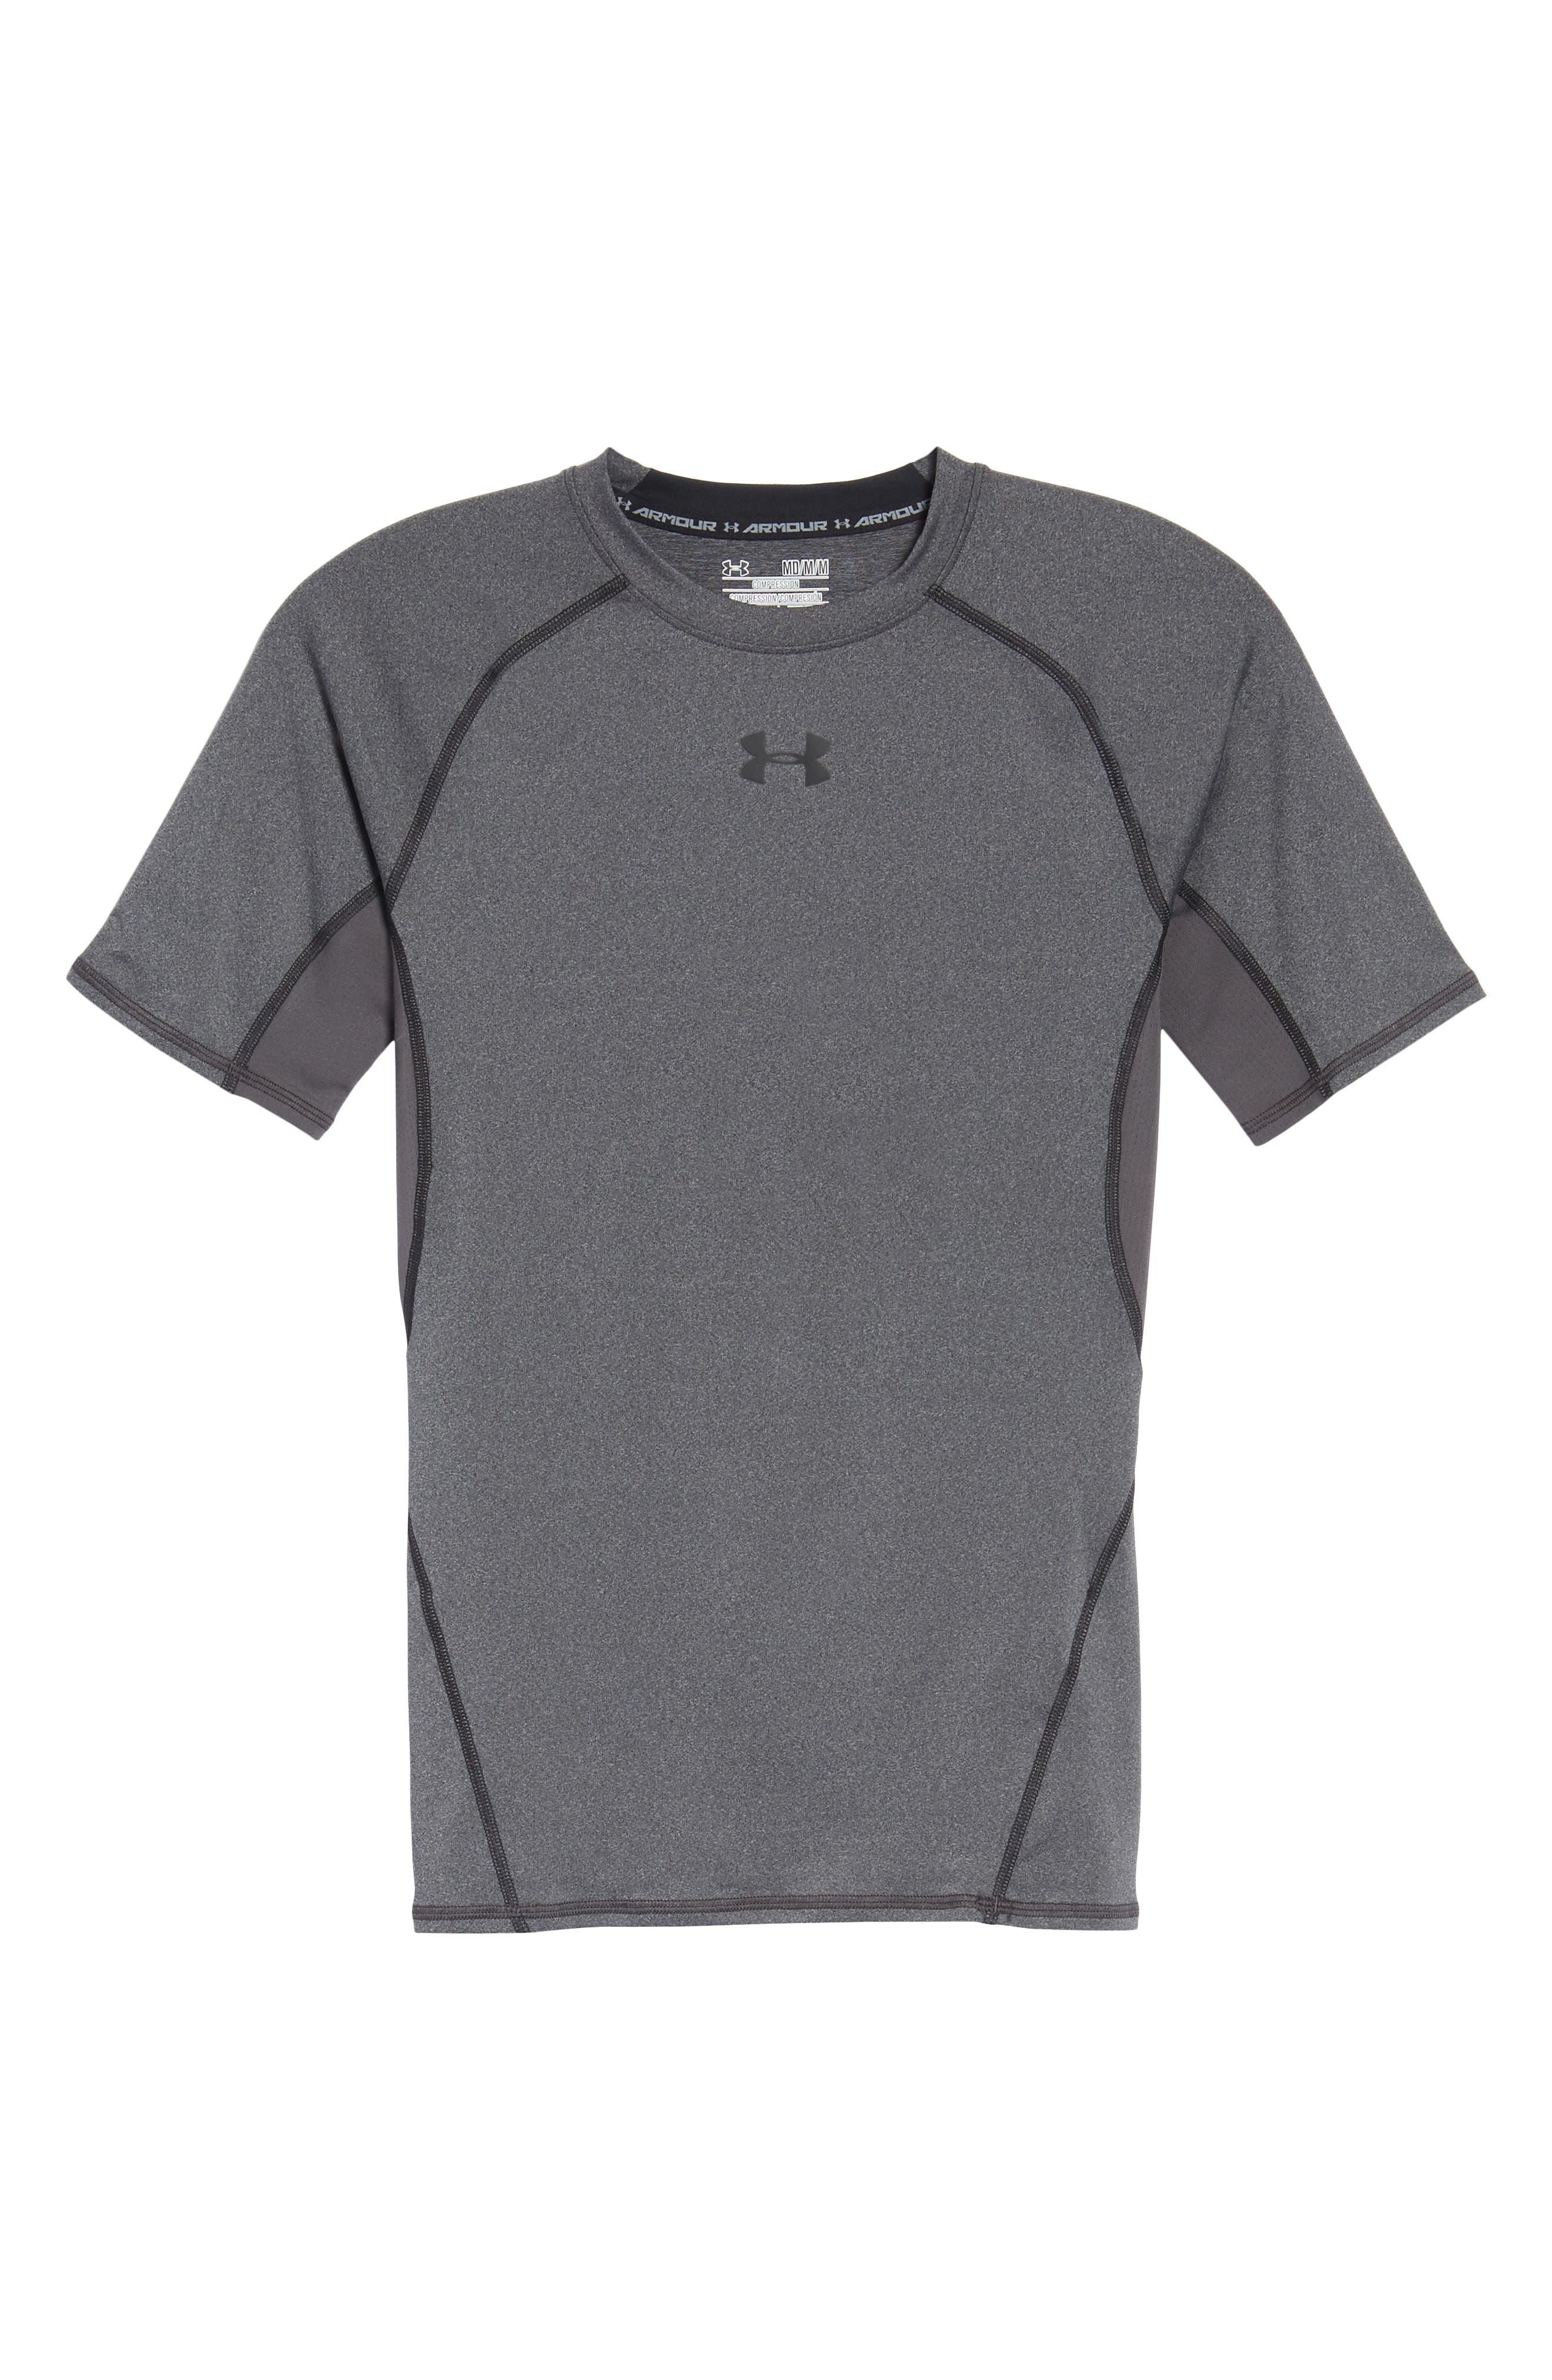 Main Image - Under Armour HeatGear® Compression Fit T-Shirt